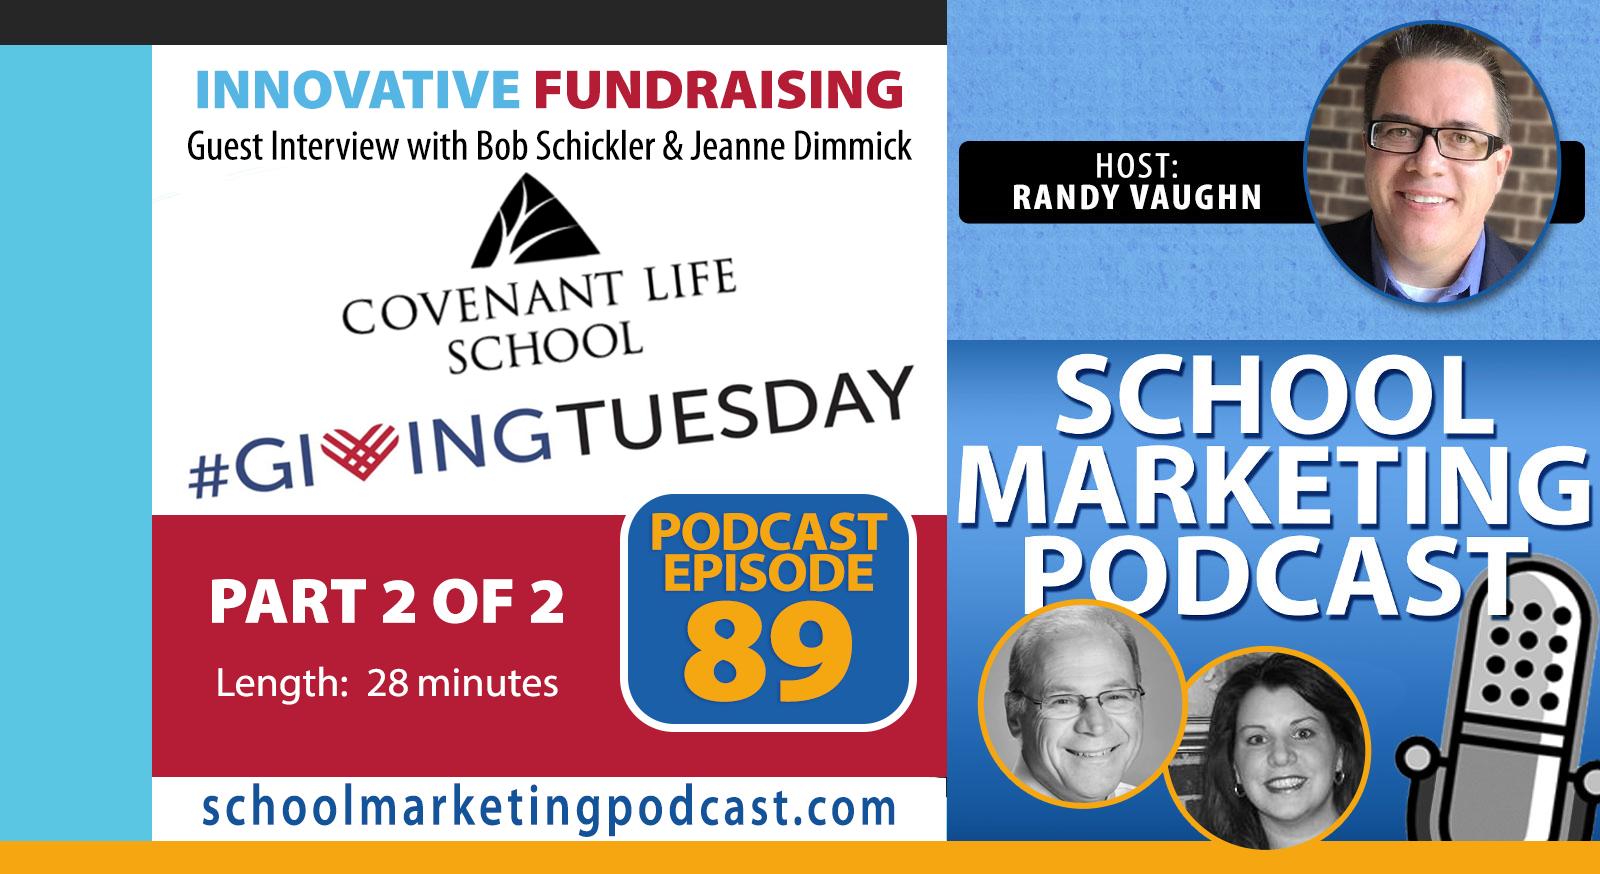 #GivingTuesday: Innovative Fundraising Ideas - Part 2 of 2 (School Marketing Podcast #89)